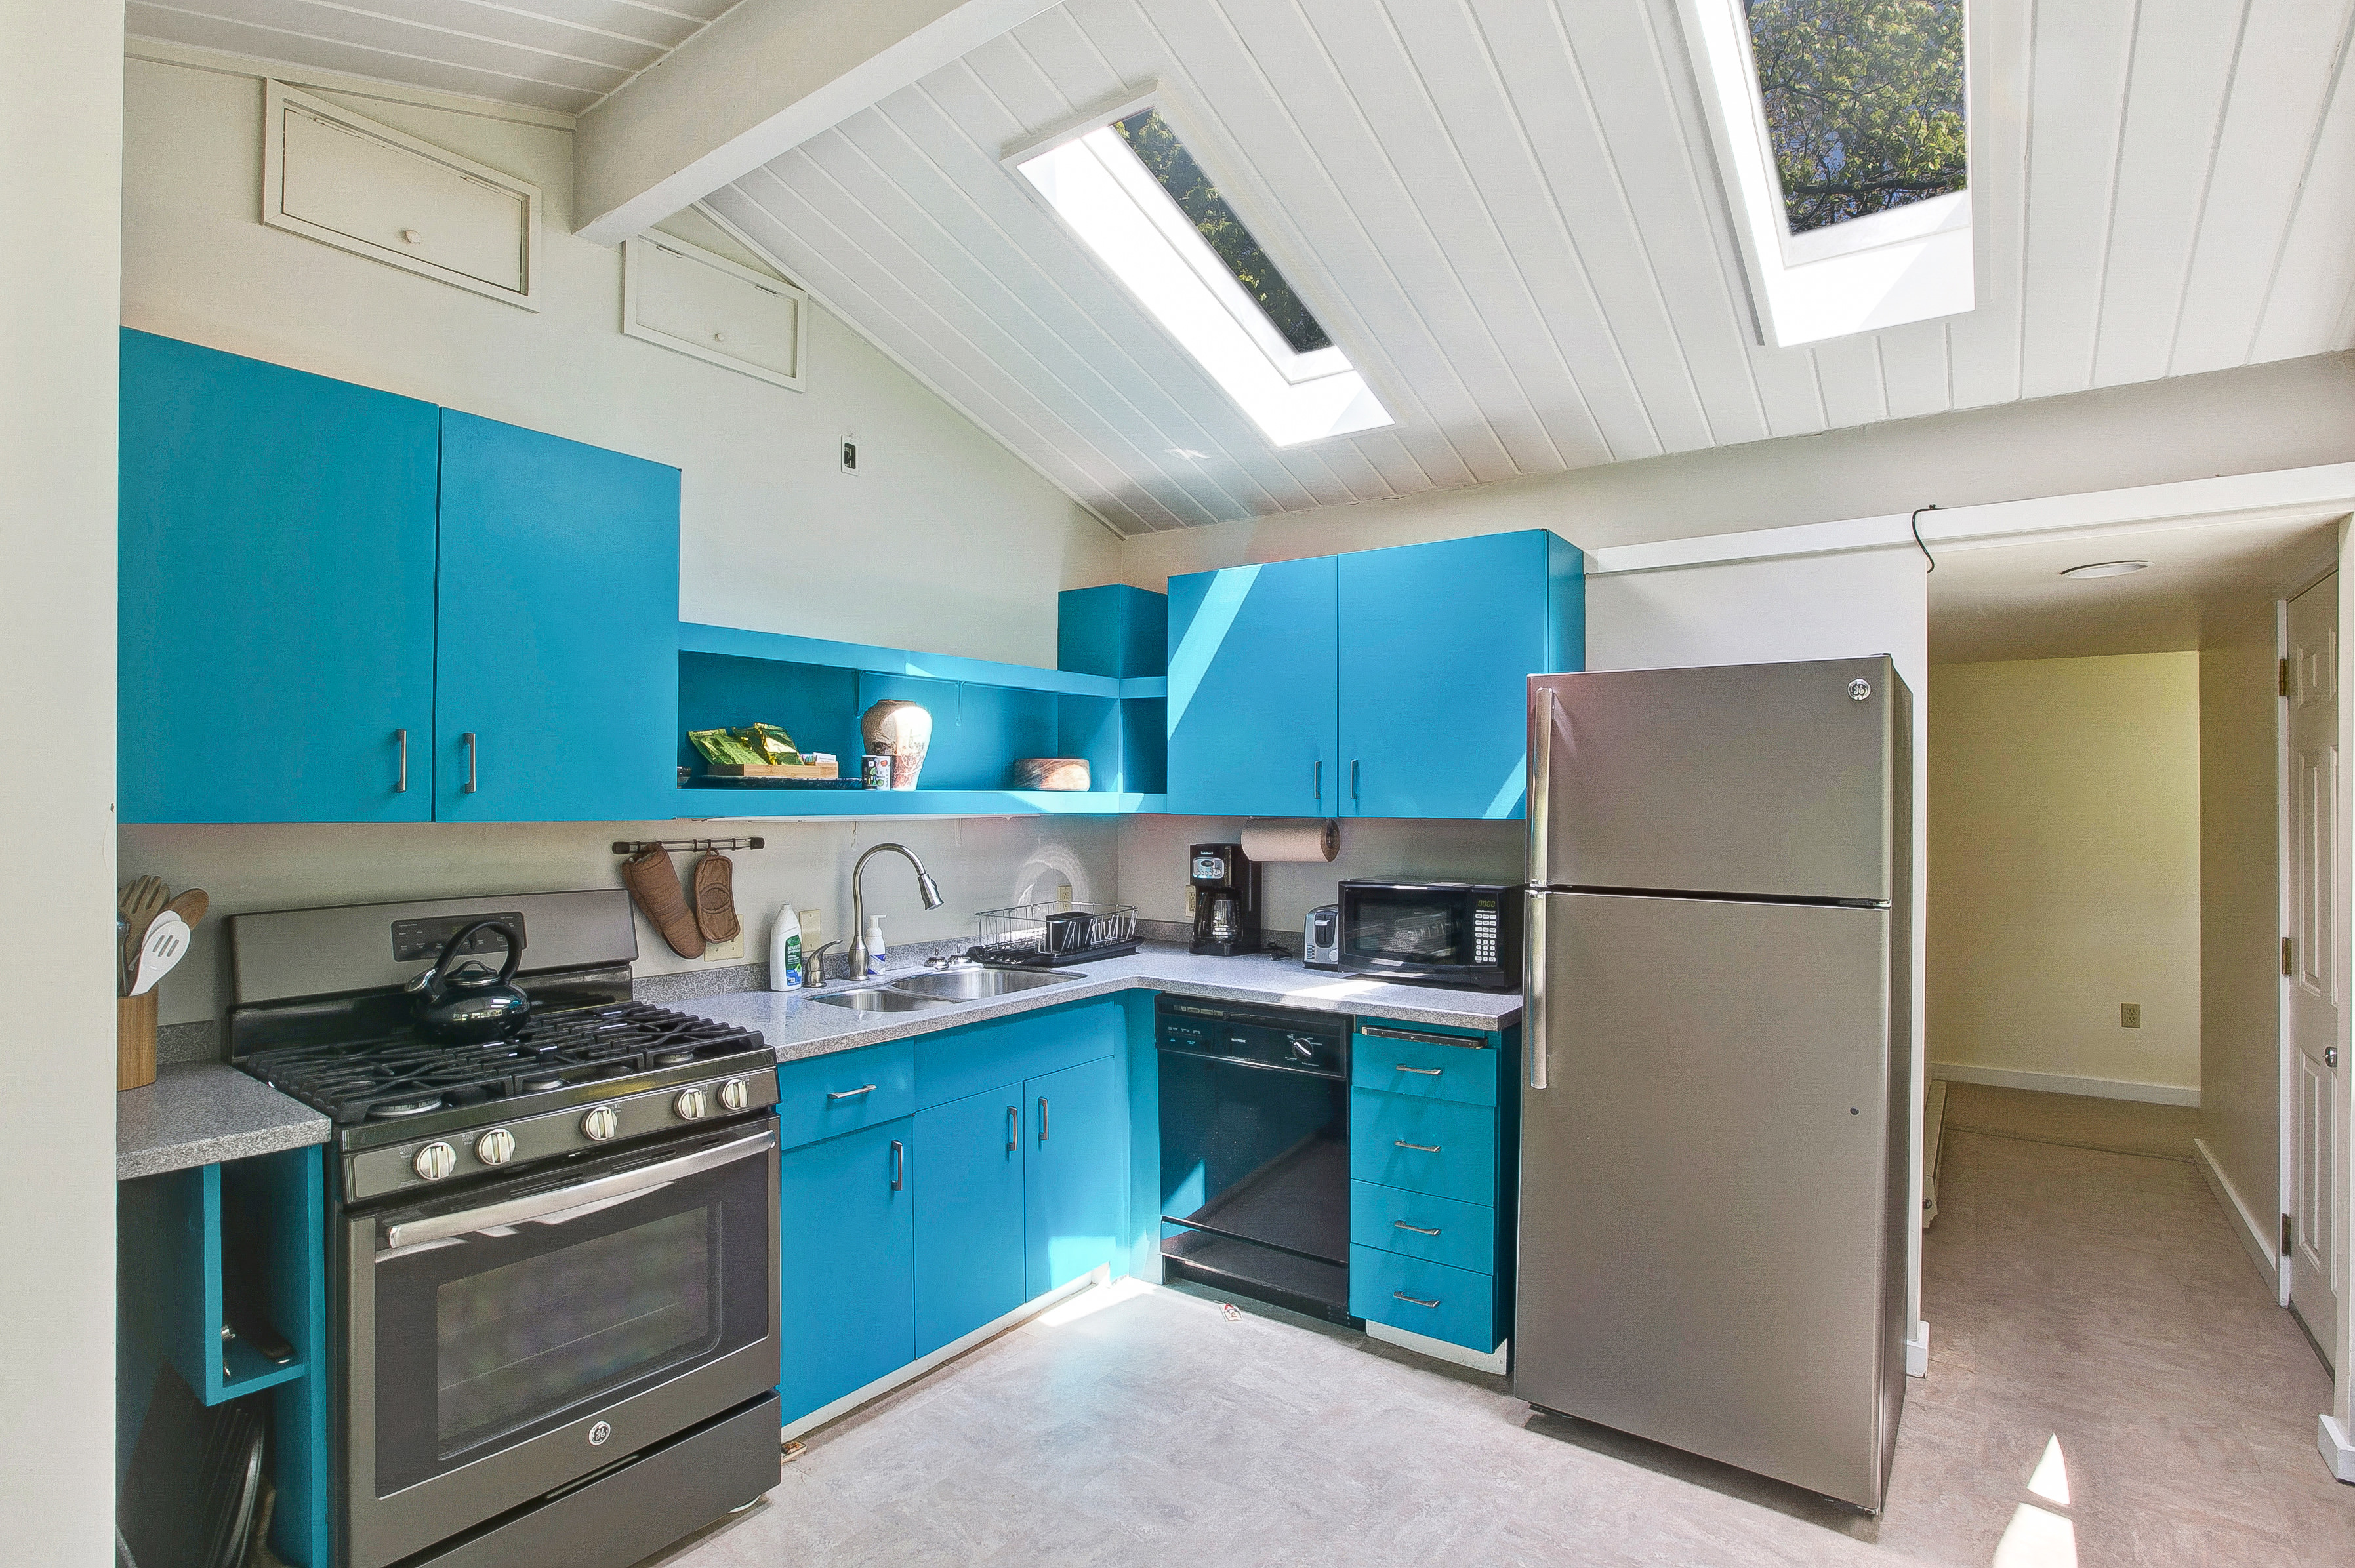 Cottages & Houses | Shelburne Farms